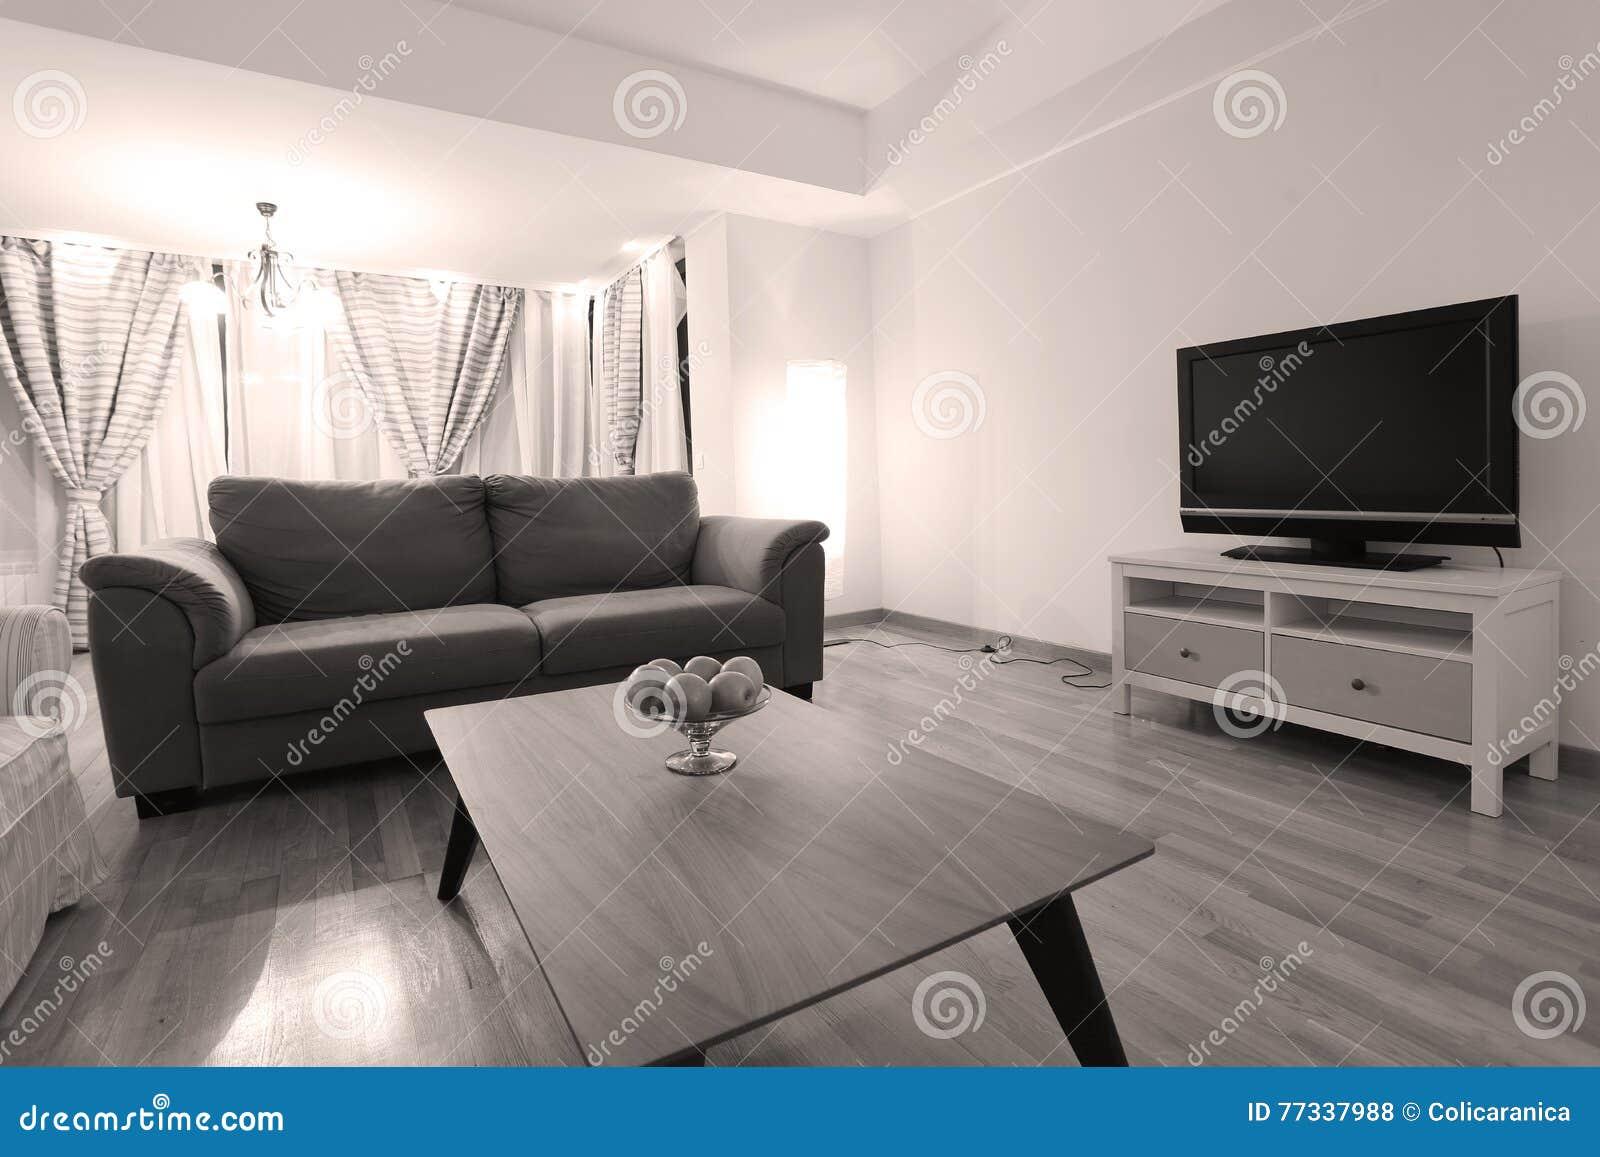 Huge Livingroom Stock Photo Image Of Lamps Armchair 77337988